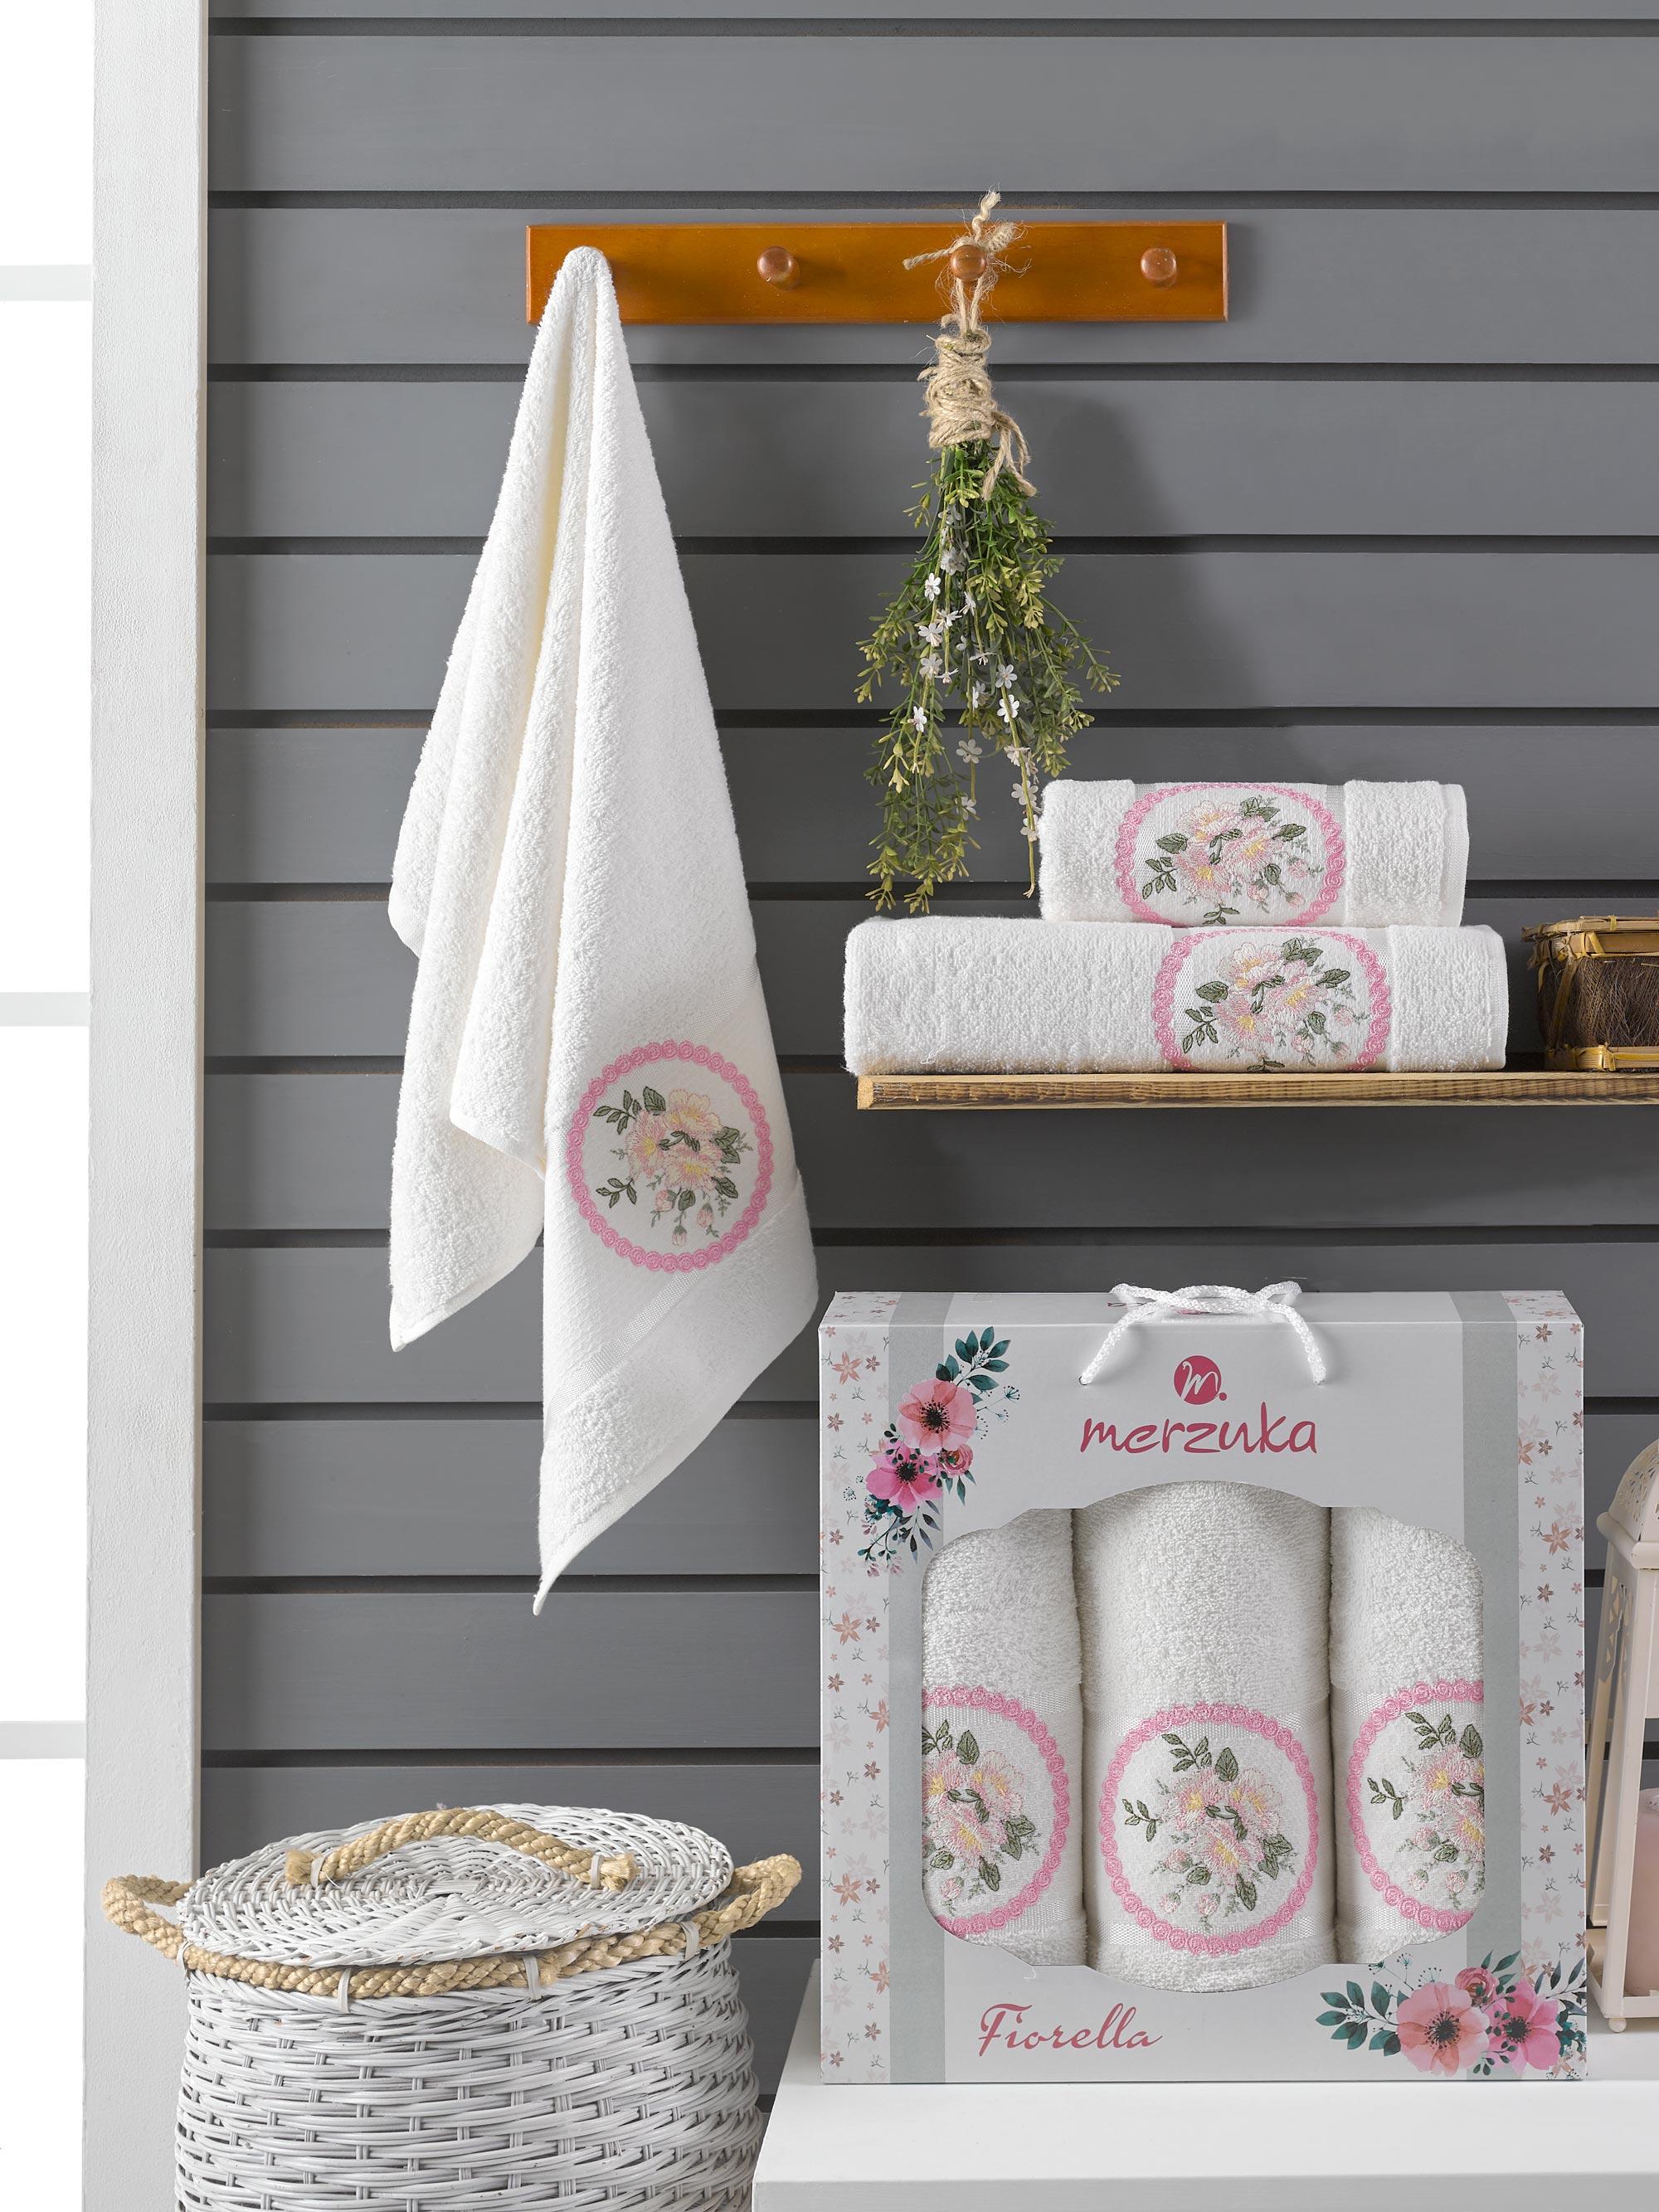 Купить Полотенца Oran Merzuka, Полотенце Florella Цвет: Кремовый (50х90 см - 2 шт, 70х140 см), Турция, Махра